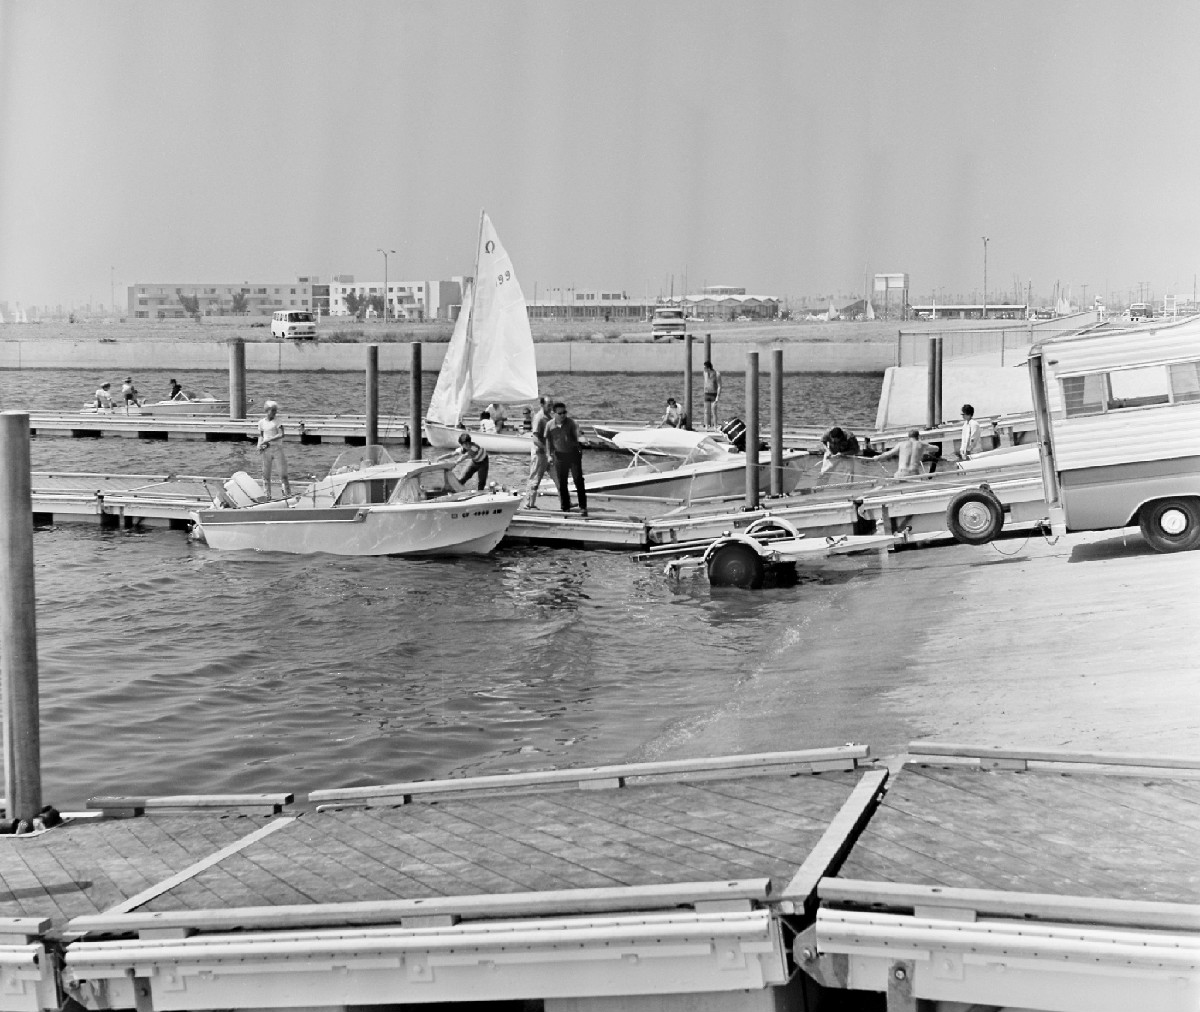 Public Boat Ramp